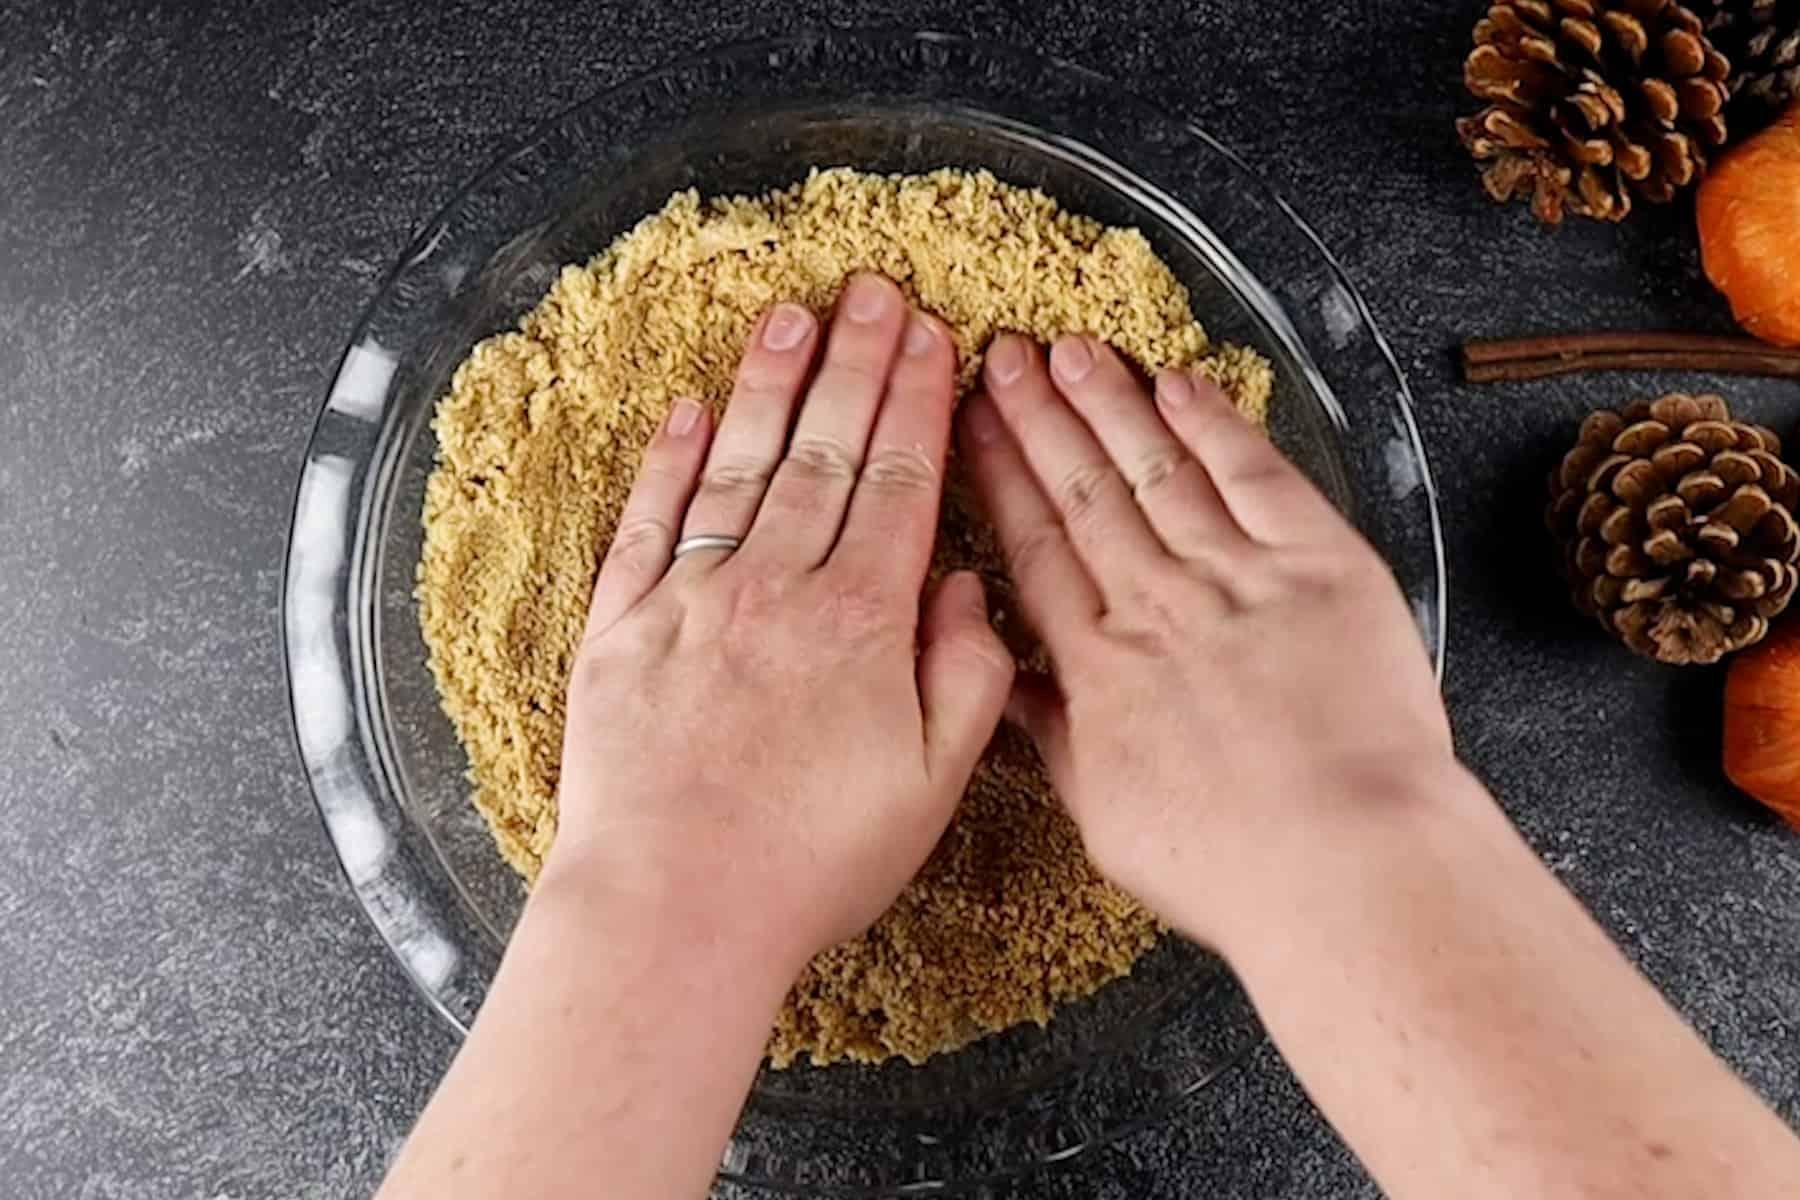 pressing in the graham cracker crust